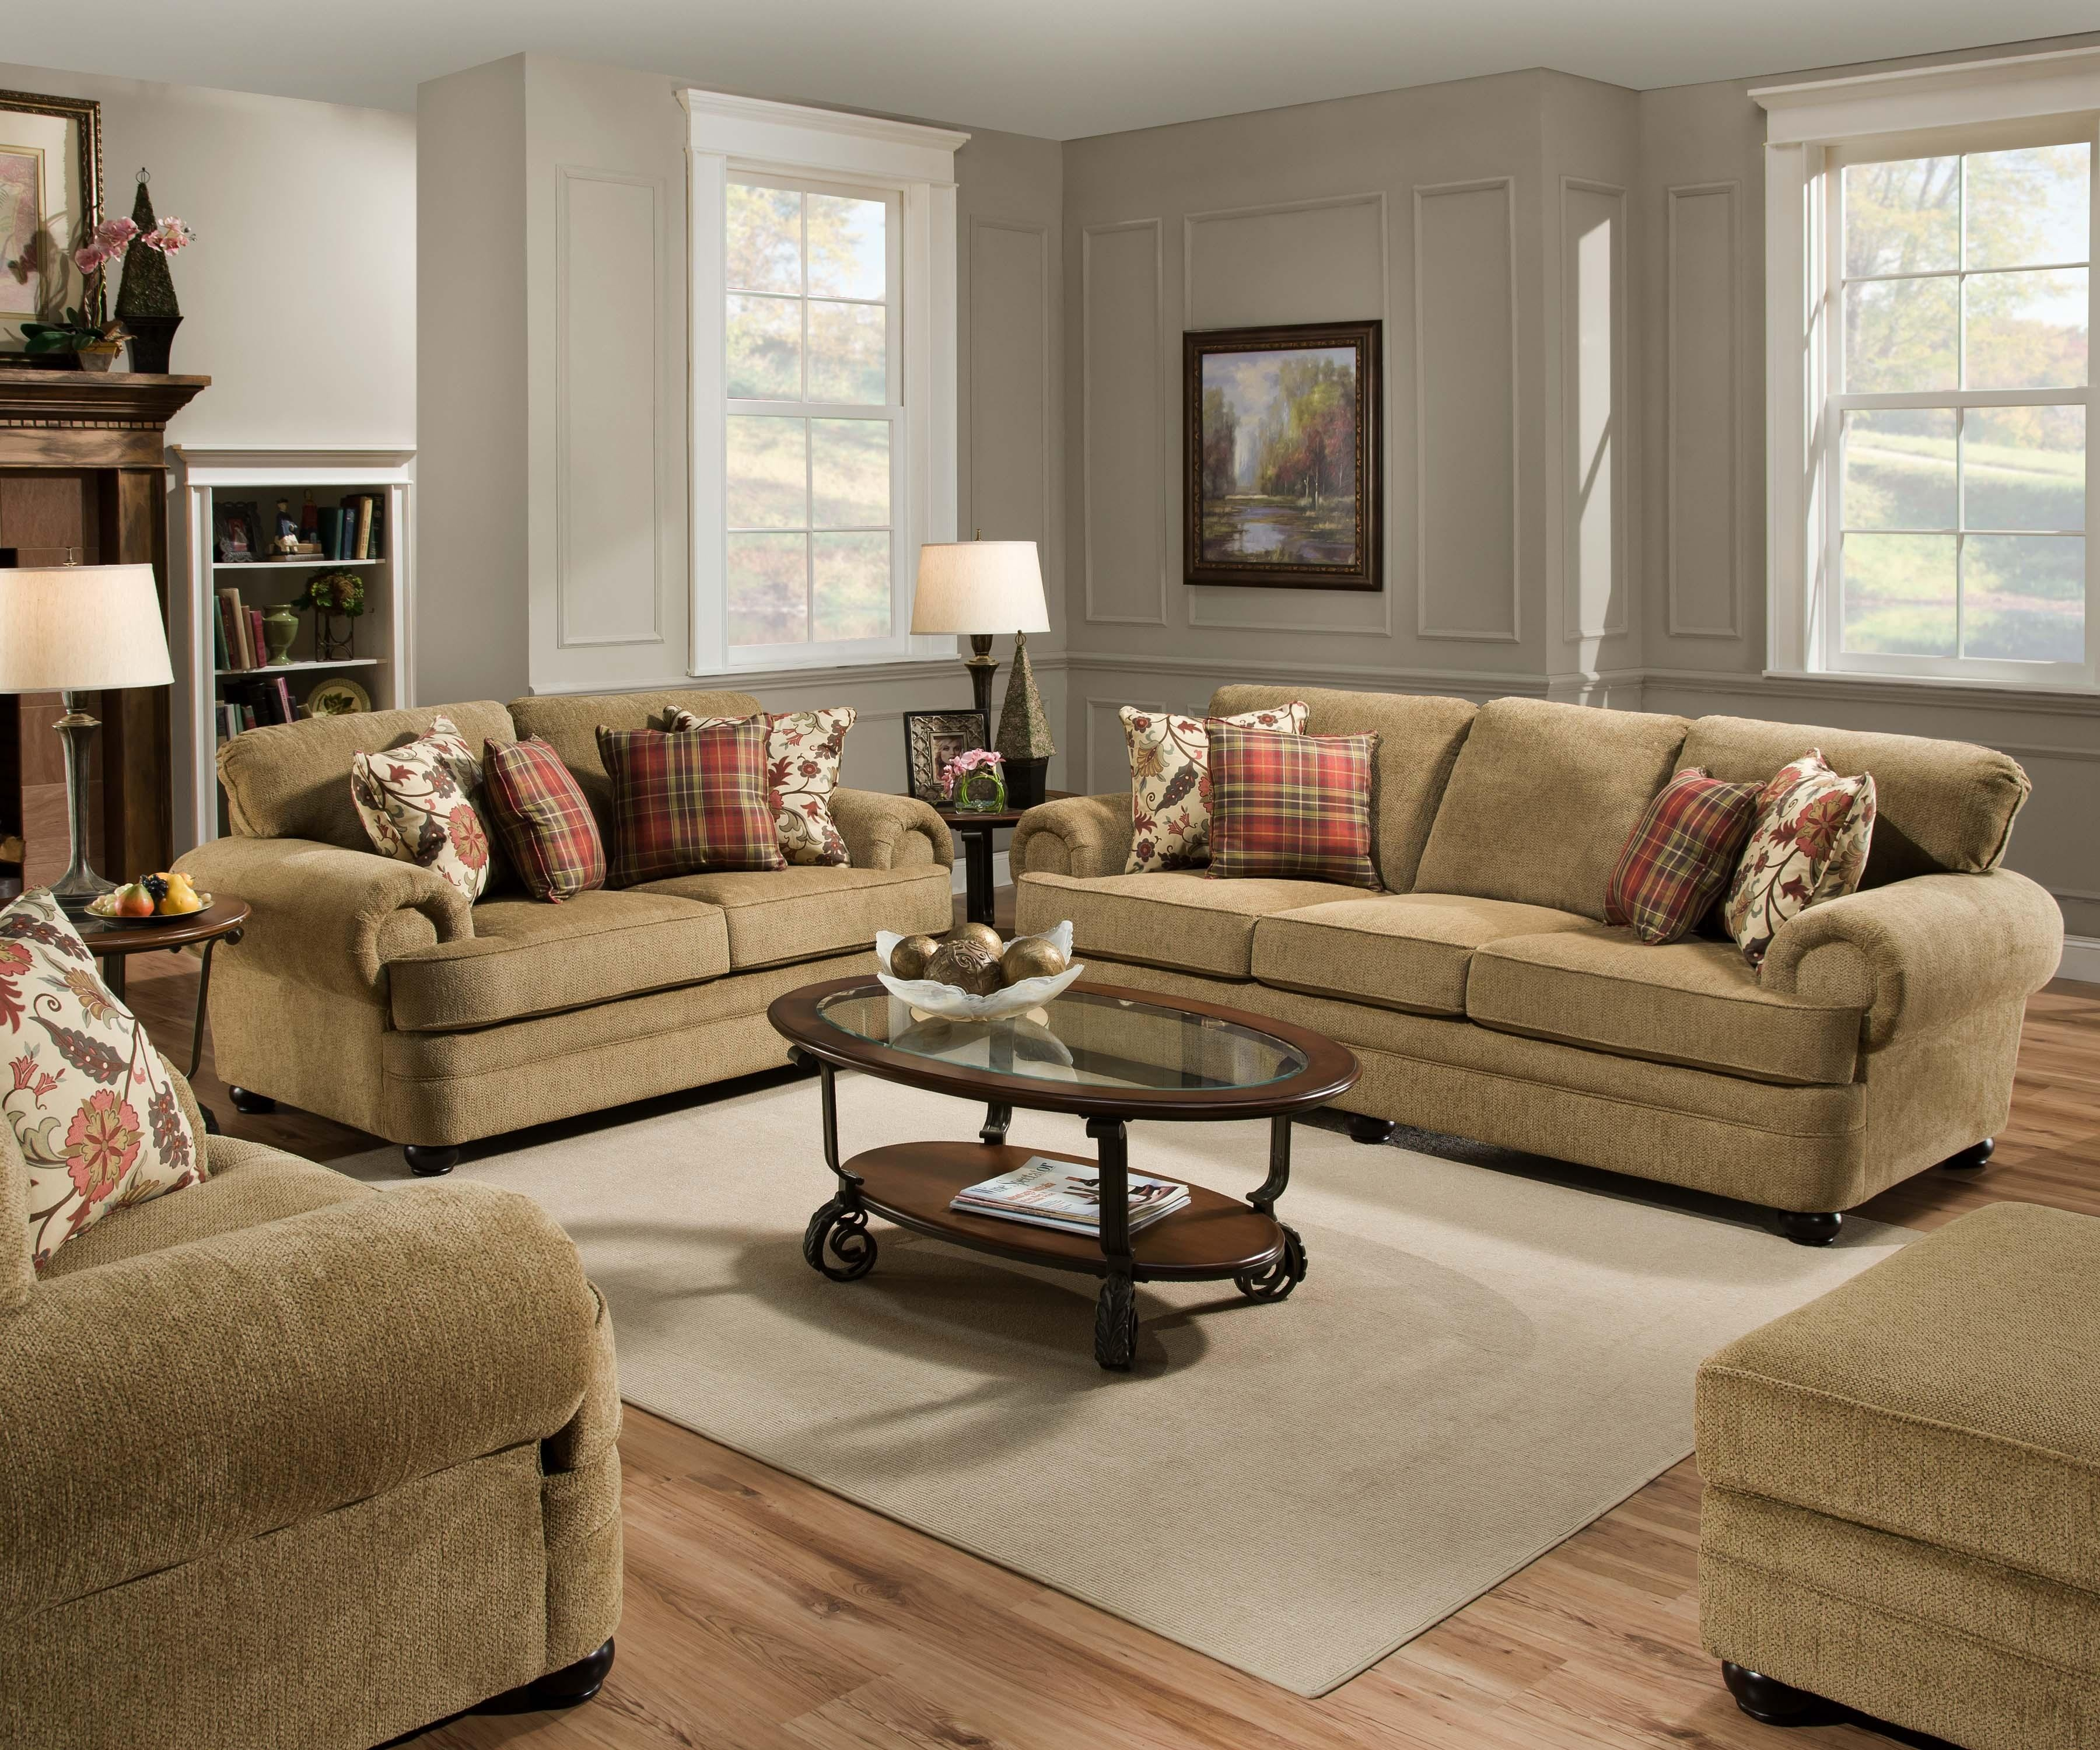 Furniture clearance center upholstered - Cojines para sofas de piel ...